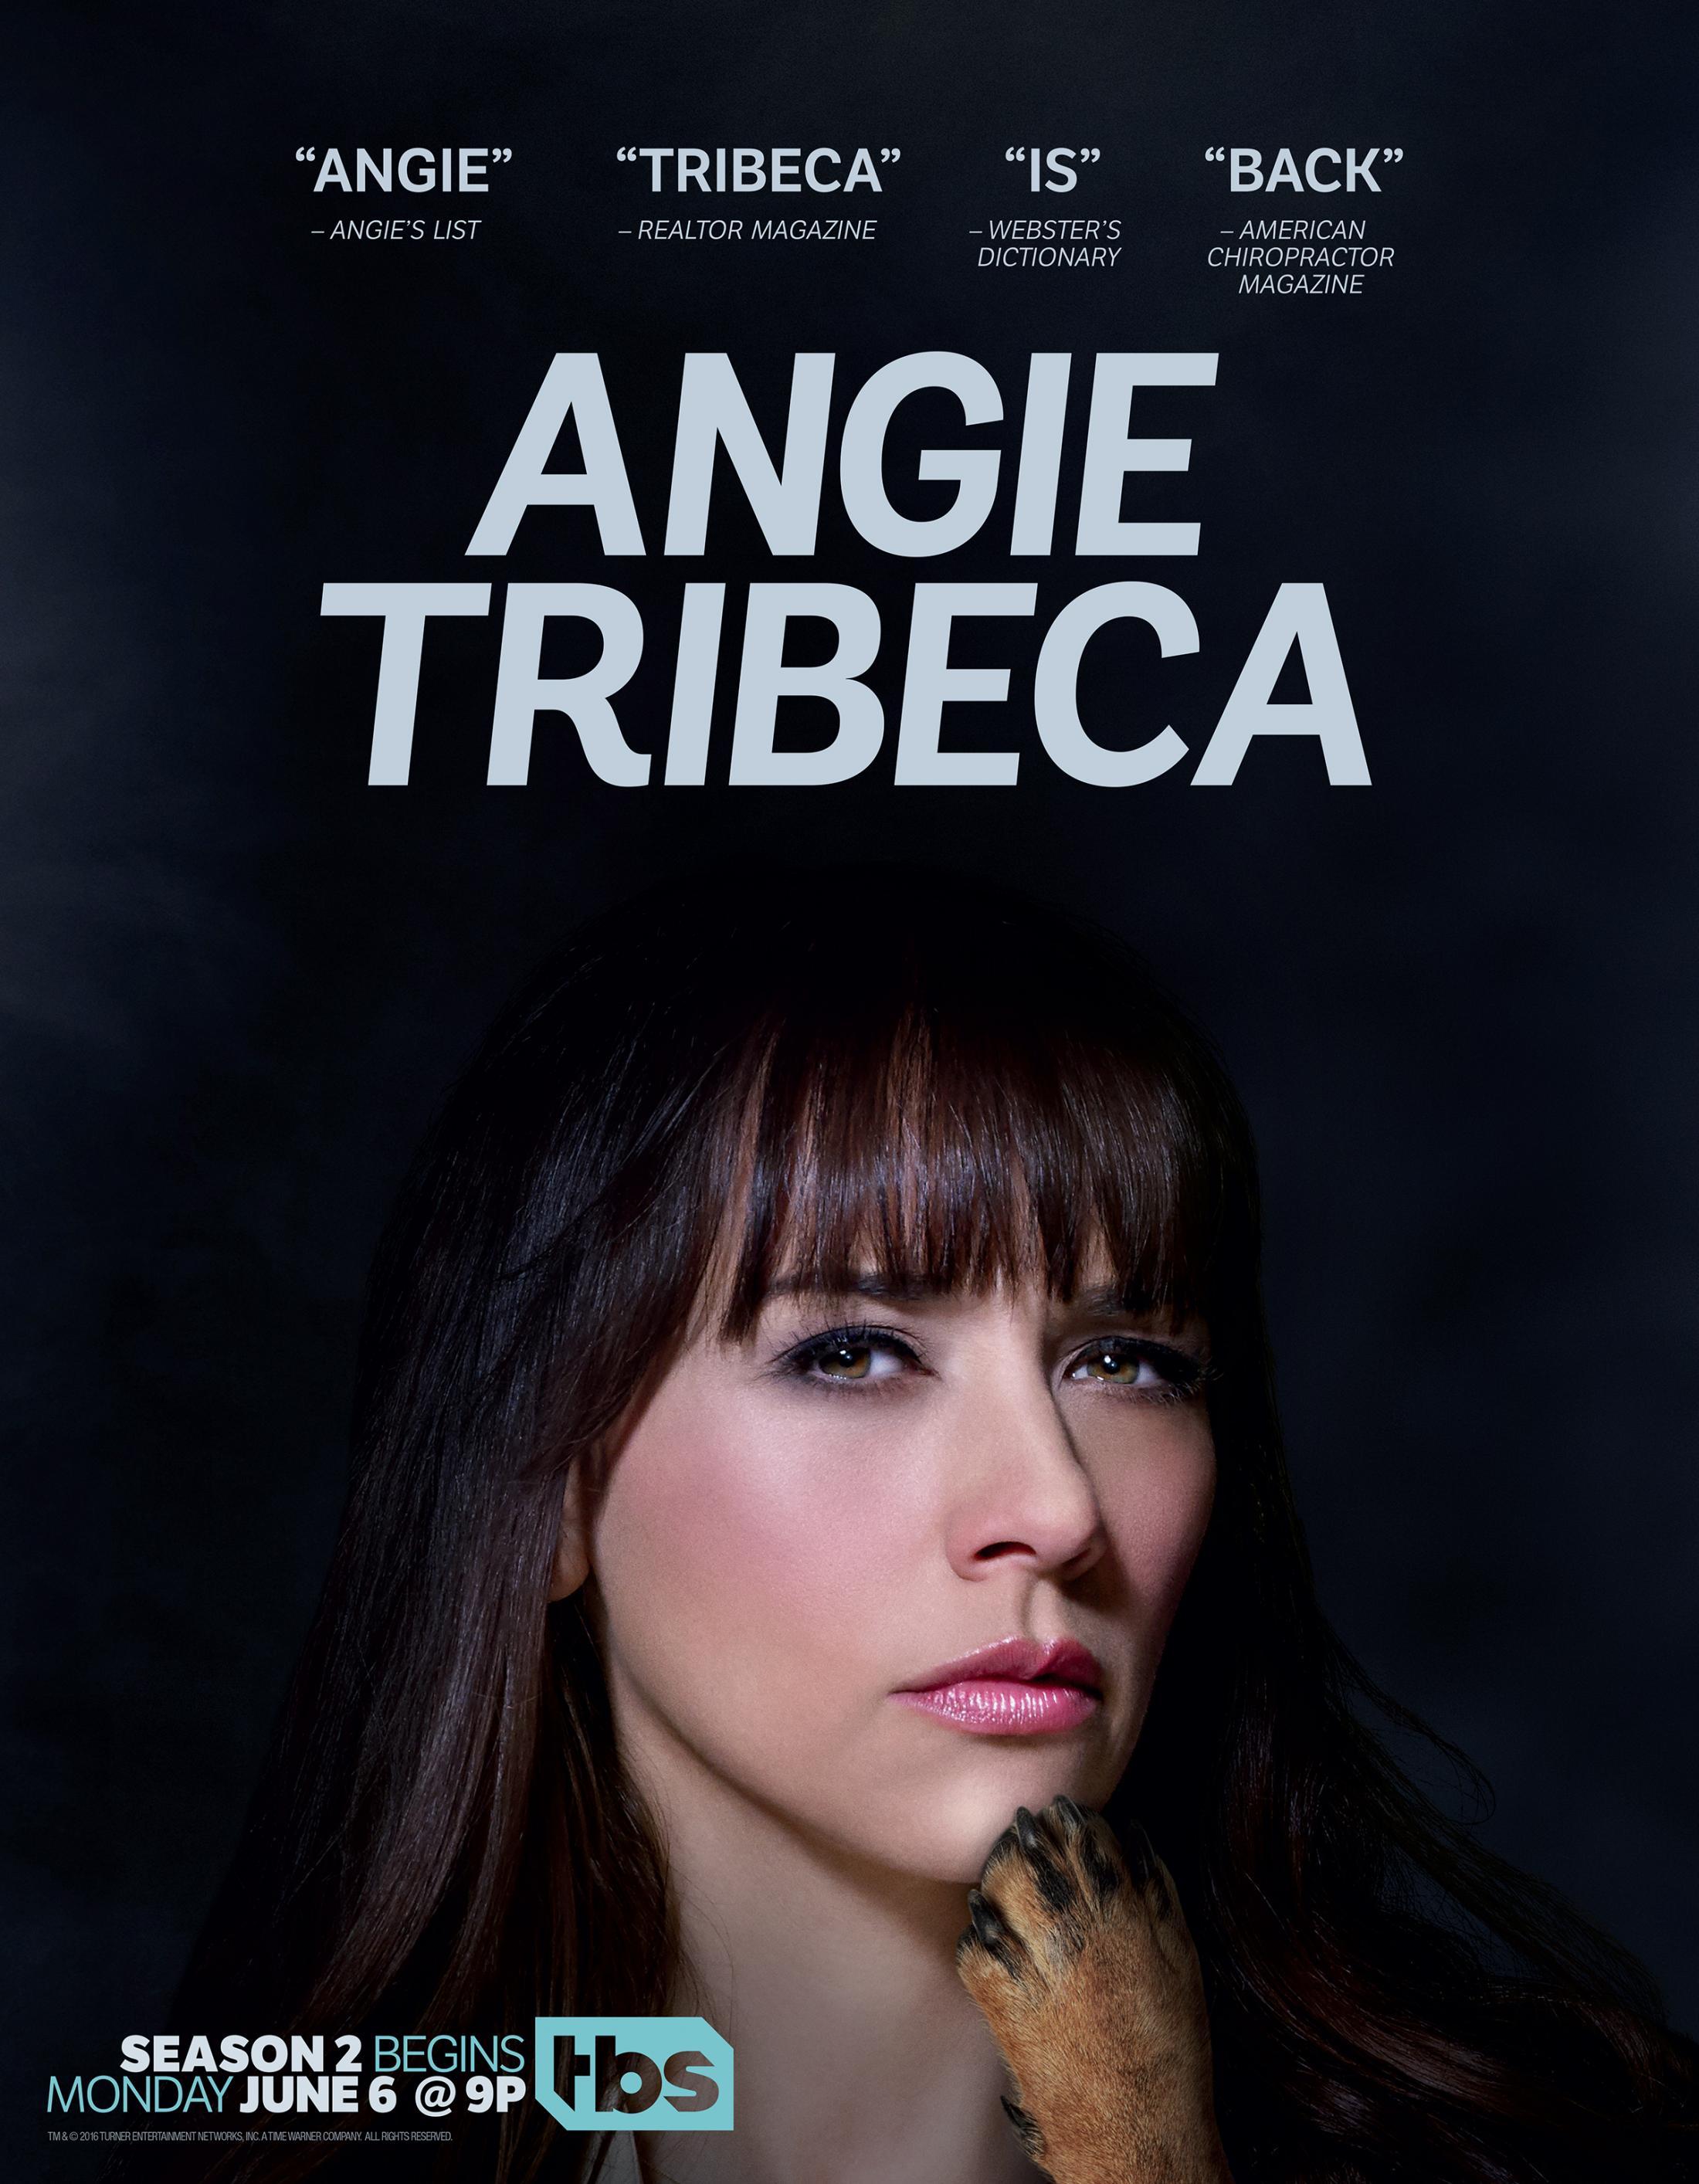 Thumbnail for Angie Tribeca Season 2 One Sheet